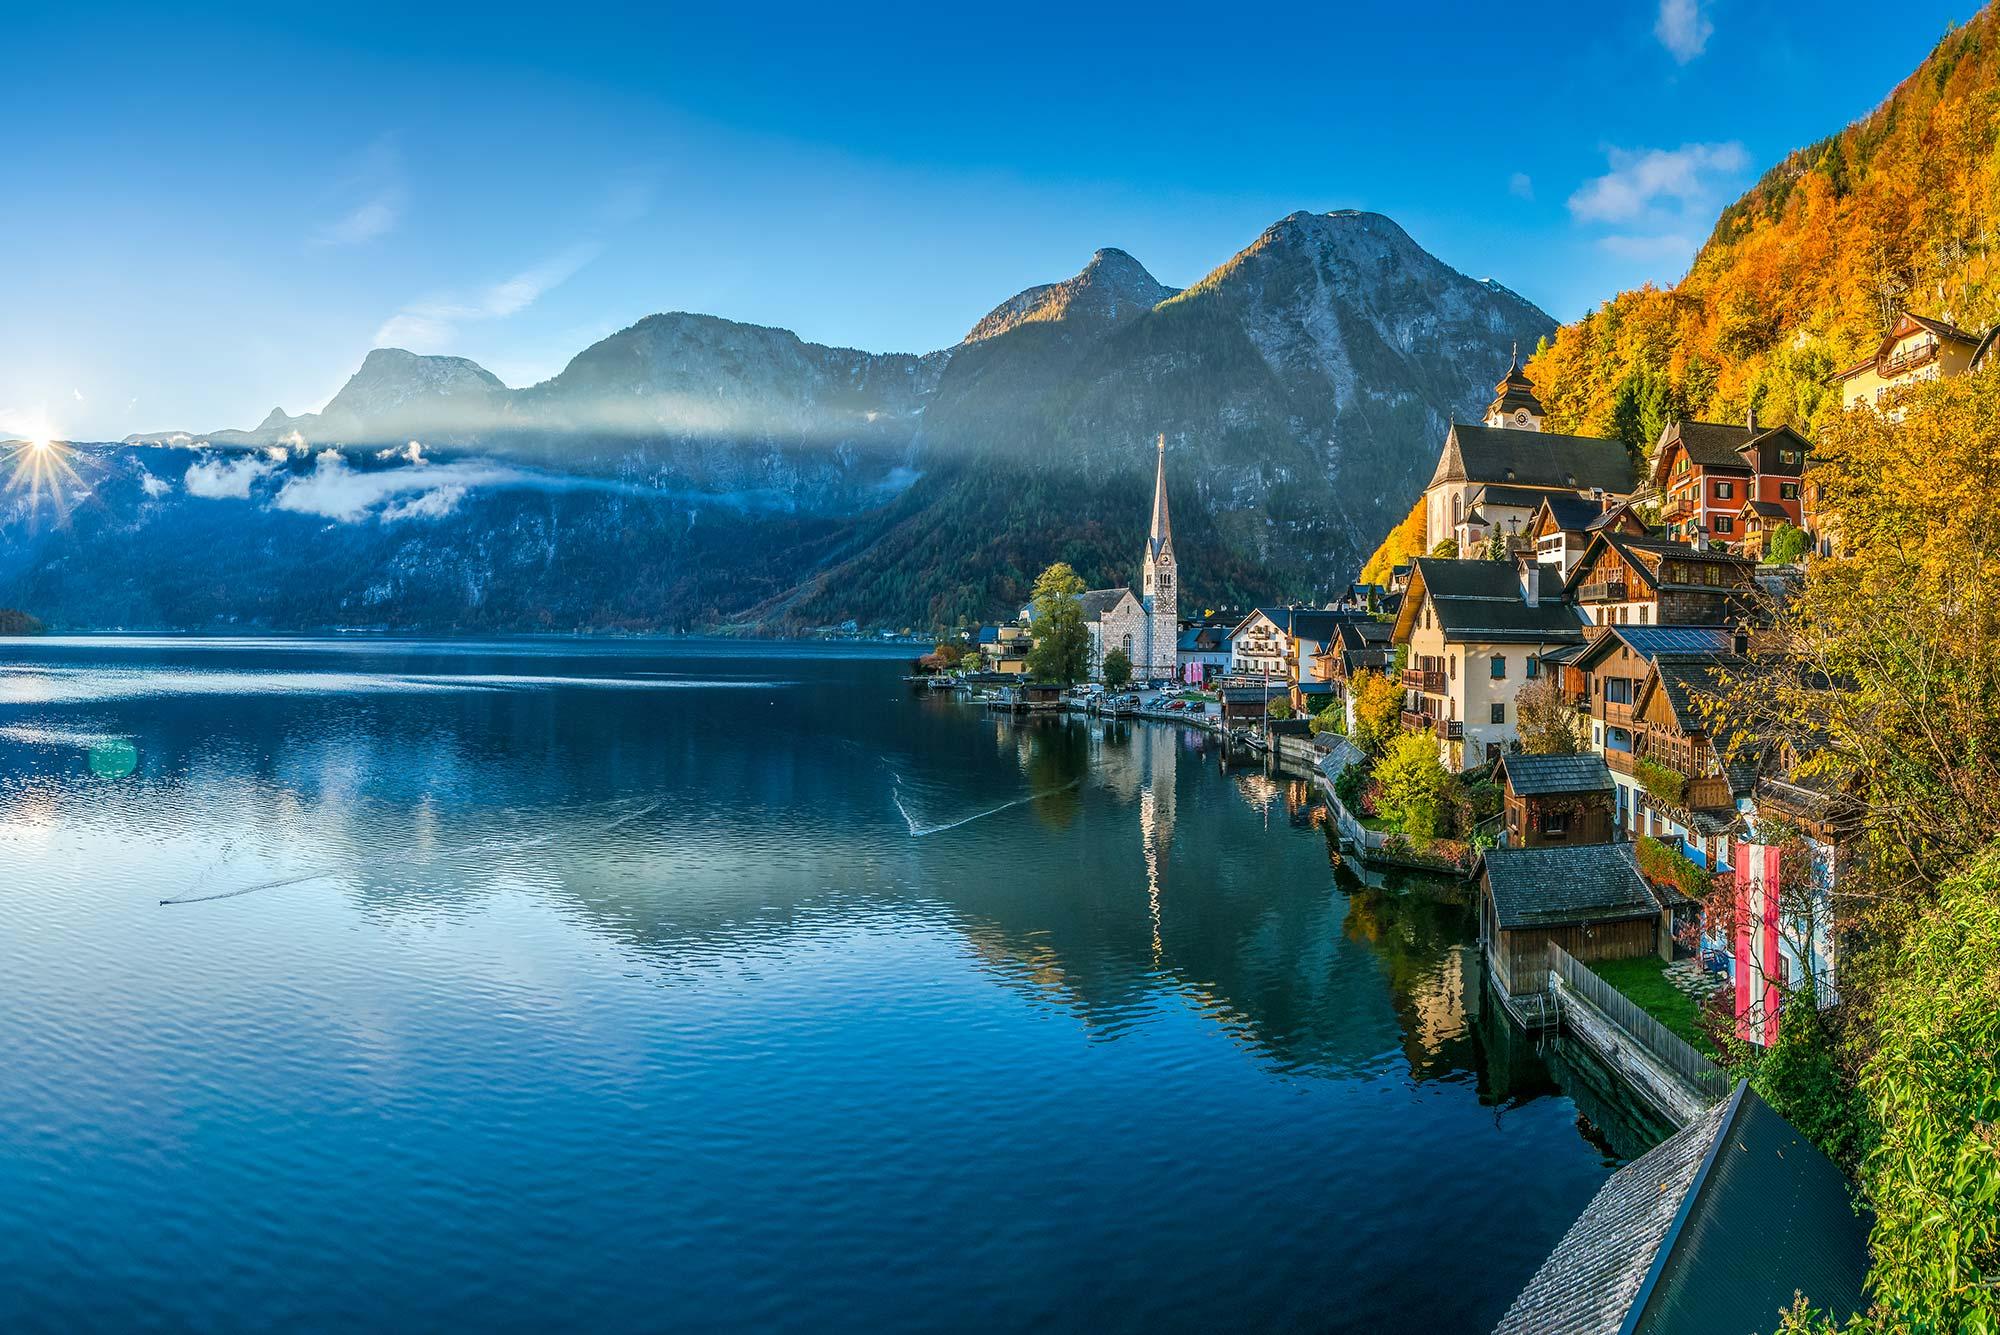 Lake Halstatt in the Salzkammergut, Austria.